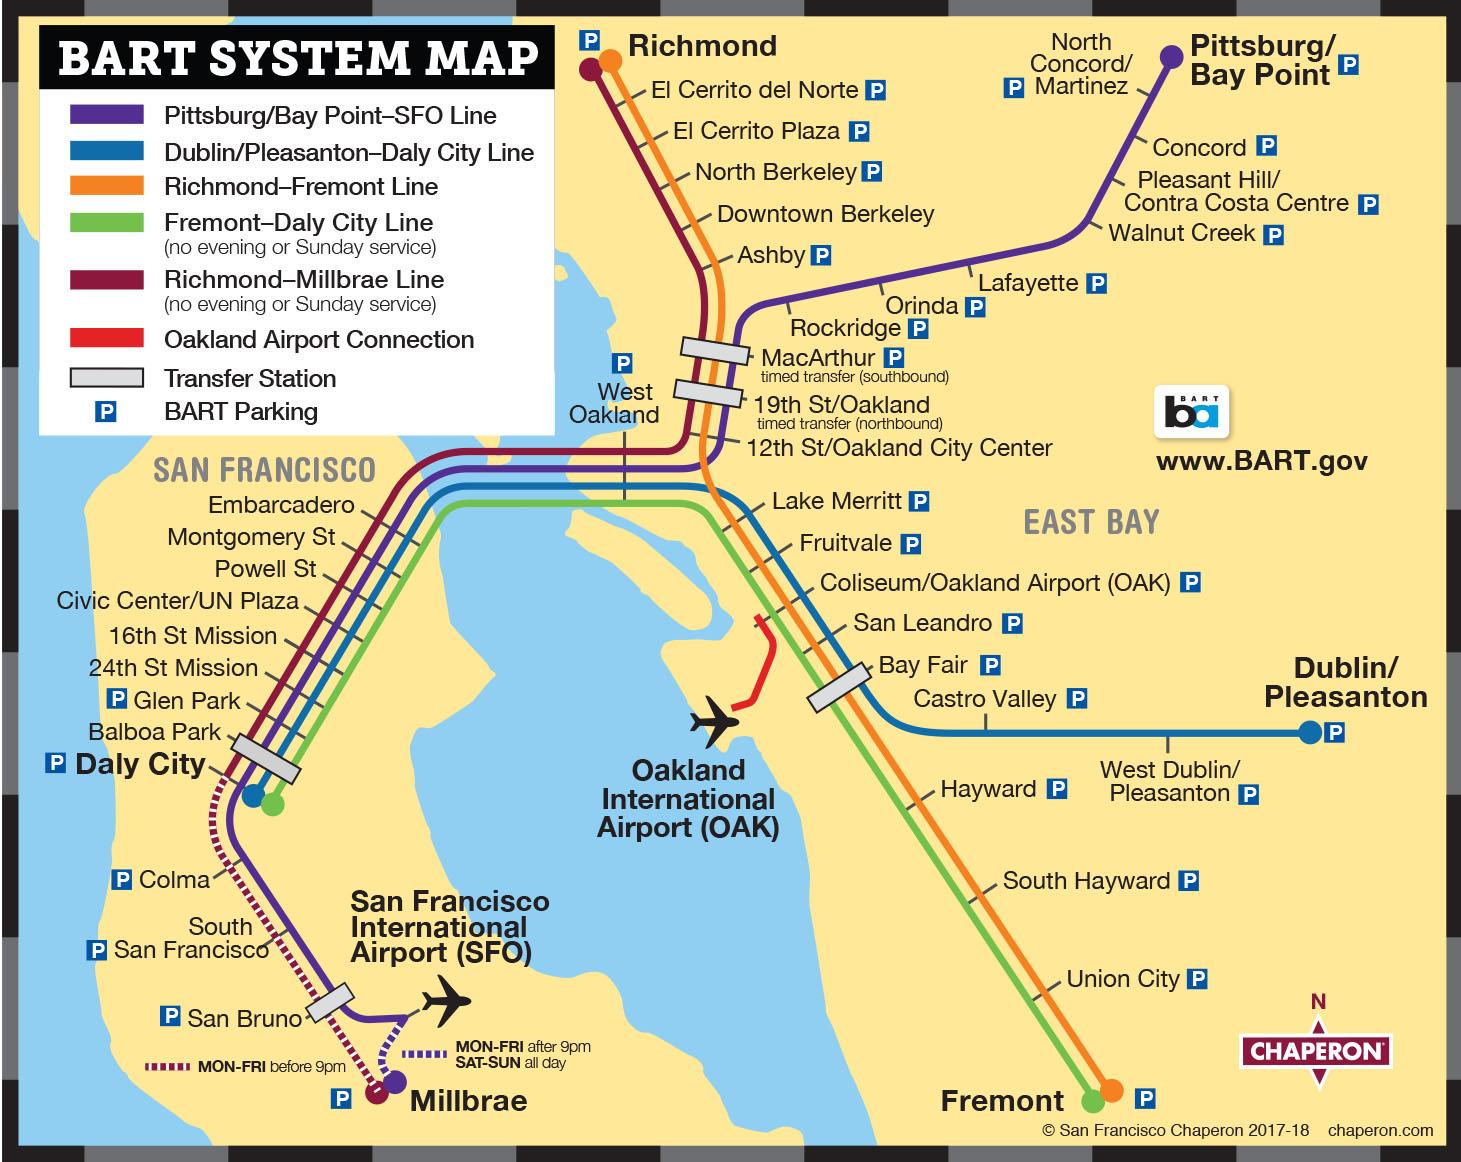 San Francisco Transportation San Francisco Visitors Guide Chaperon (рейтинг 0, 0 комментарии, 487 просмотров). san francisco chaperon